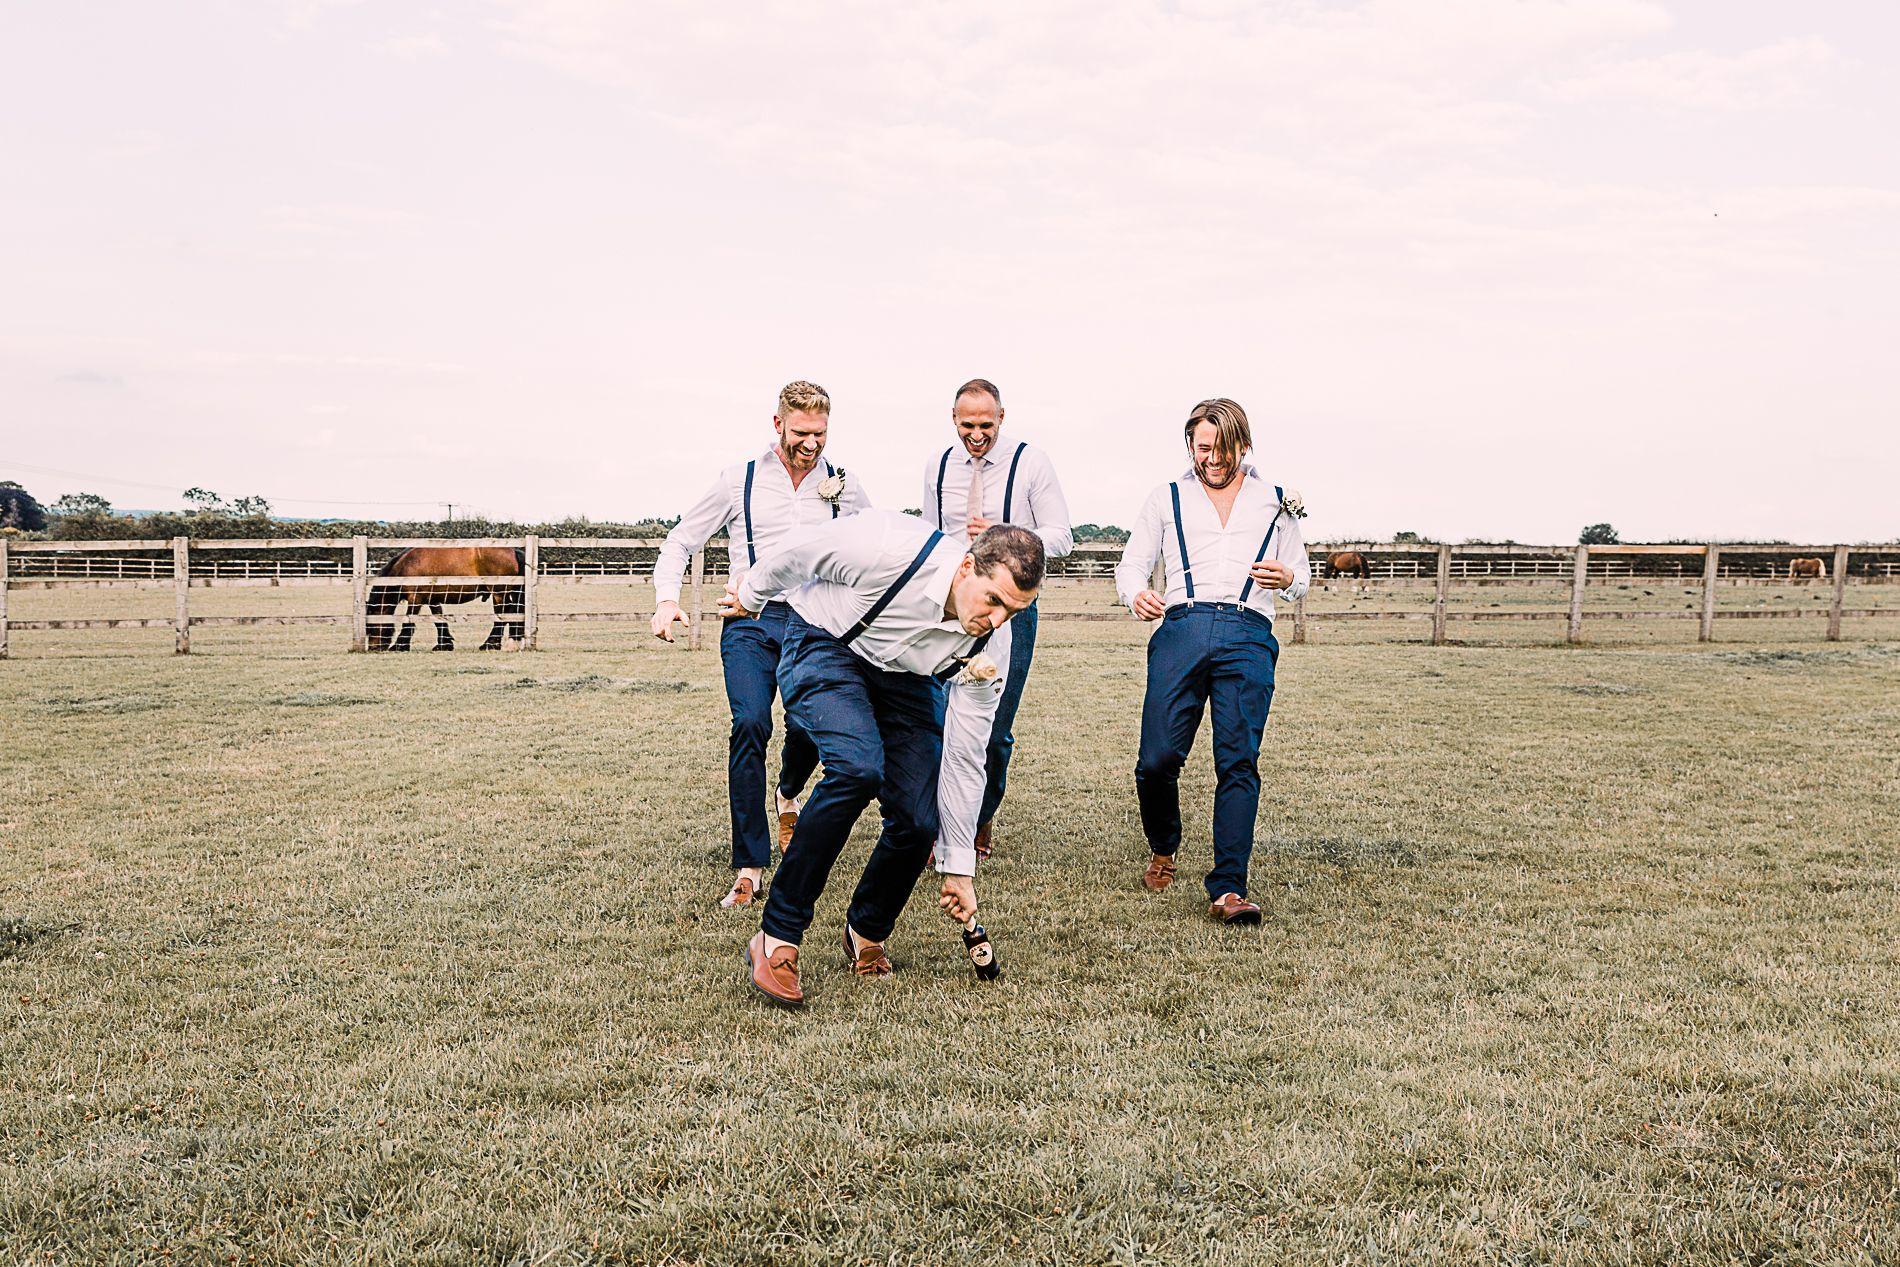 Wedding_Photography_Becky_Tranter-34.jpg